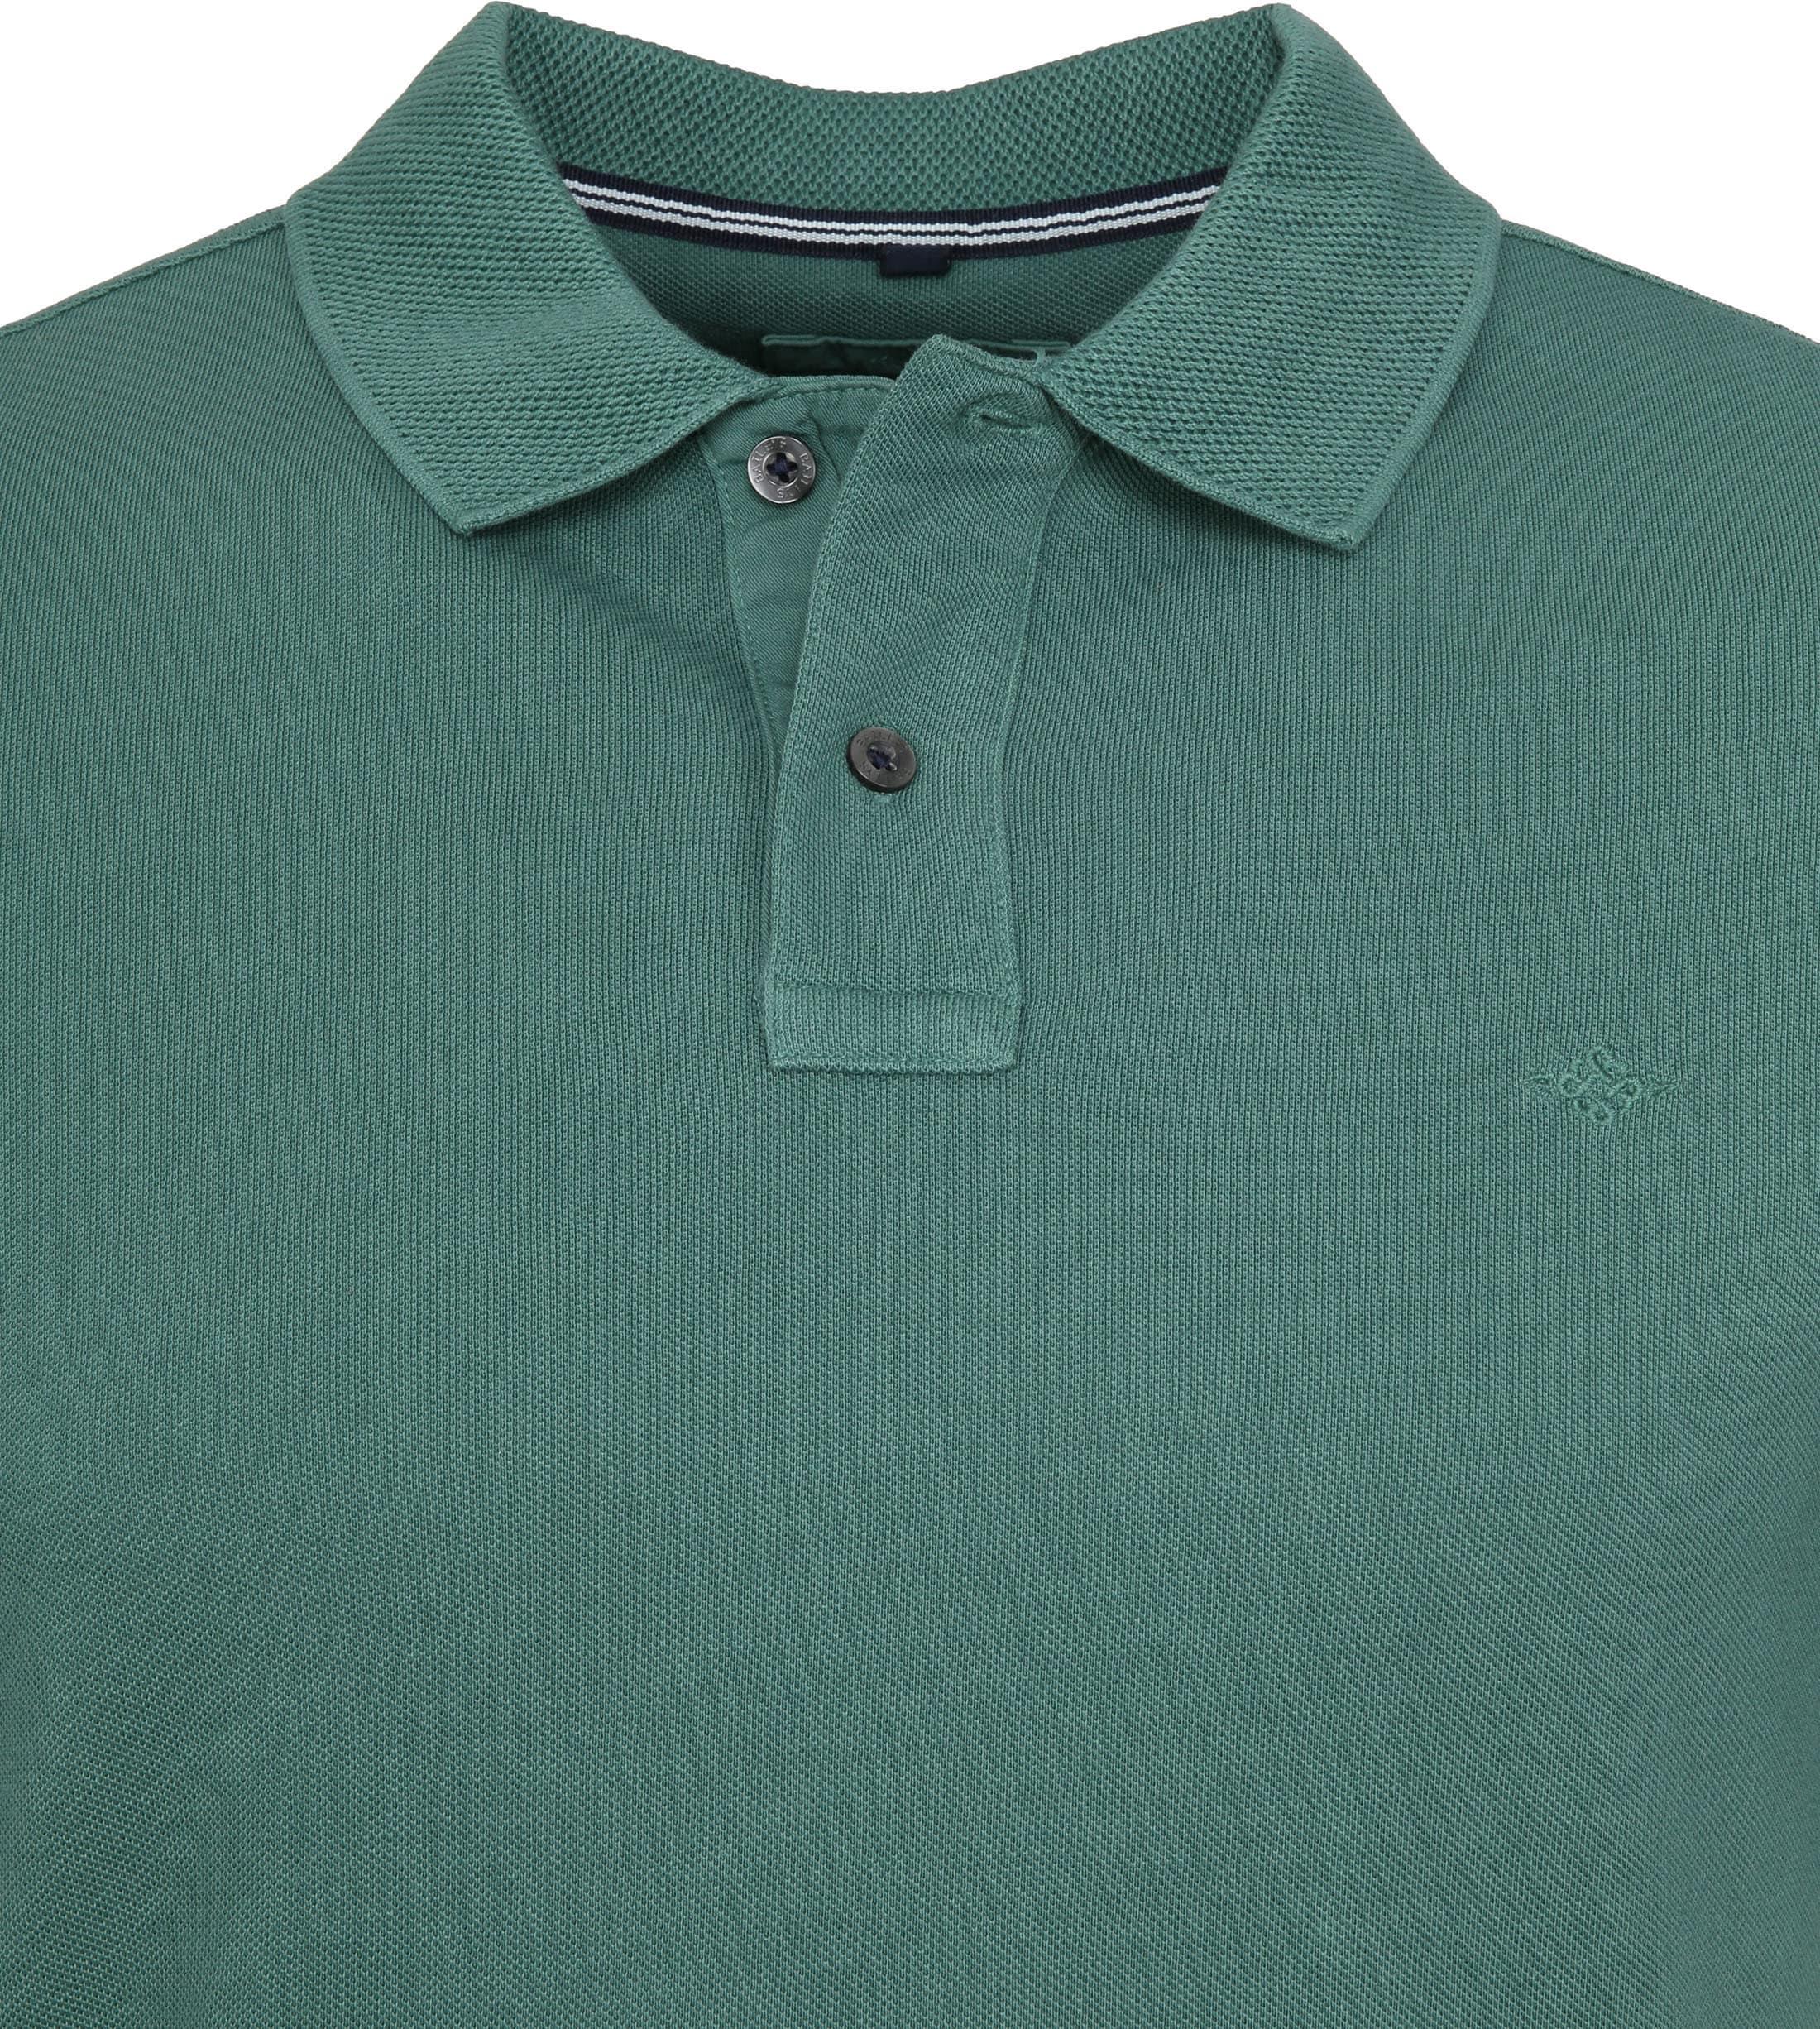 Suitable Vintage Poloshirt Groen foto 1